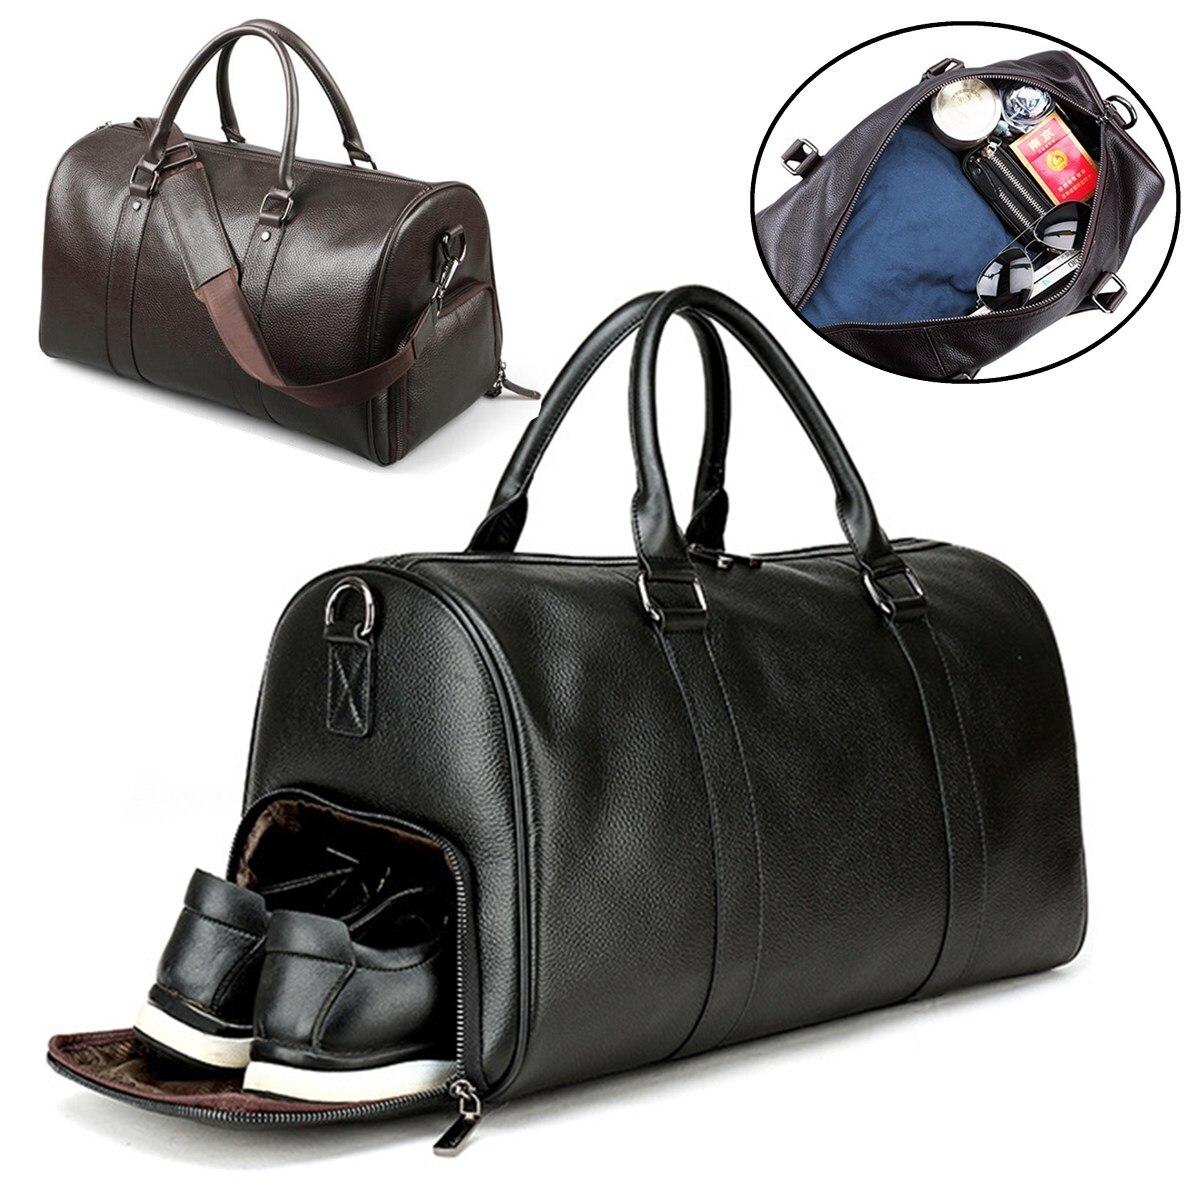 Large Travel Bag Black Fitness Yoga Shoulder Bags Separate Space For Shoes Handbags Men Leather Luggage Sac De Storage Package